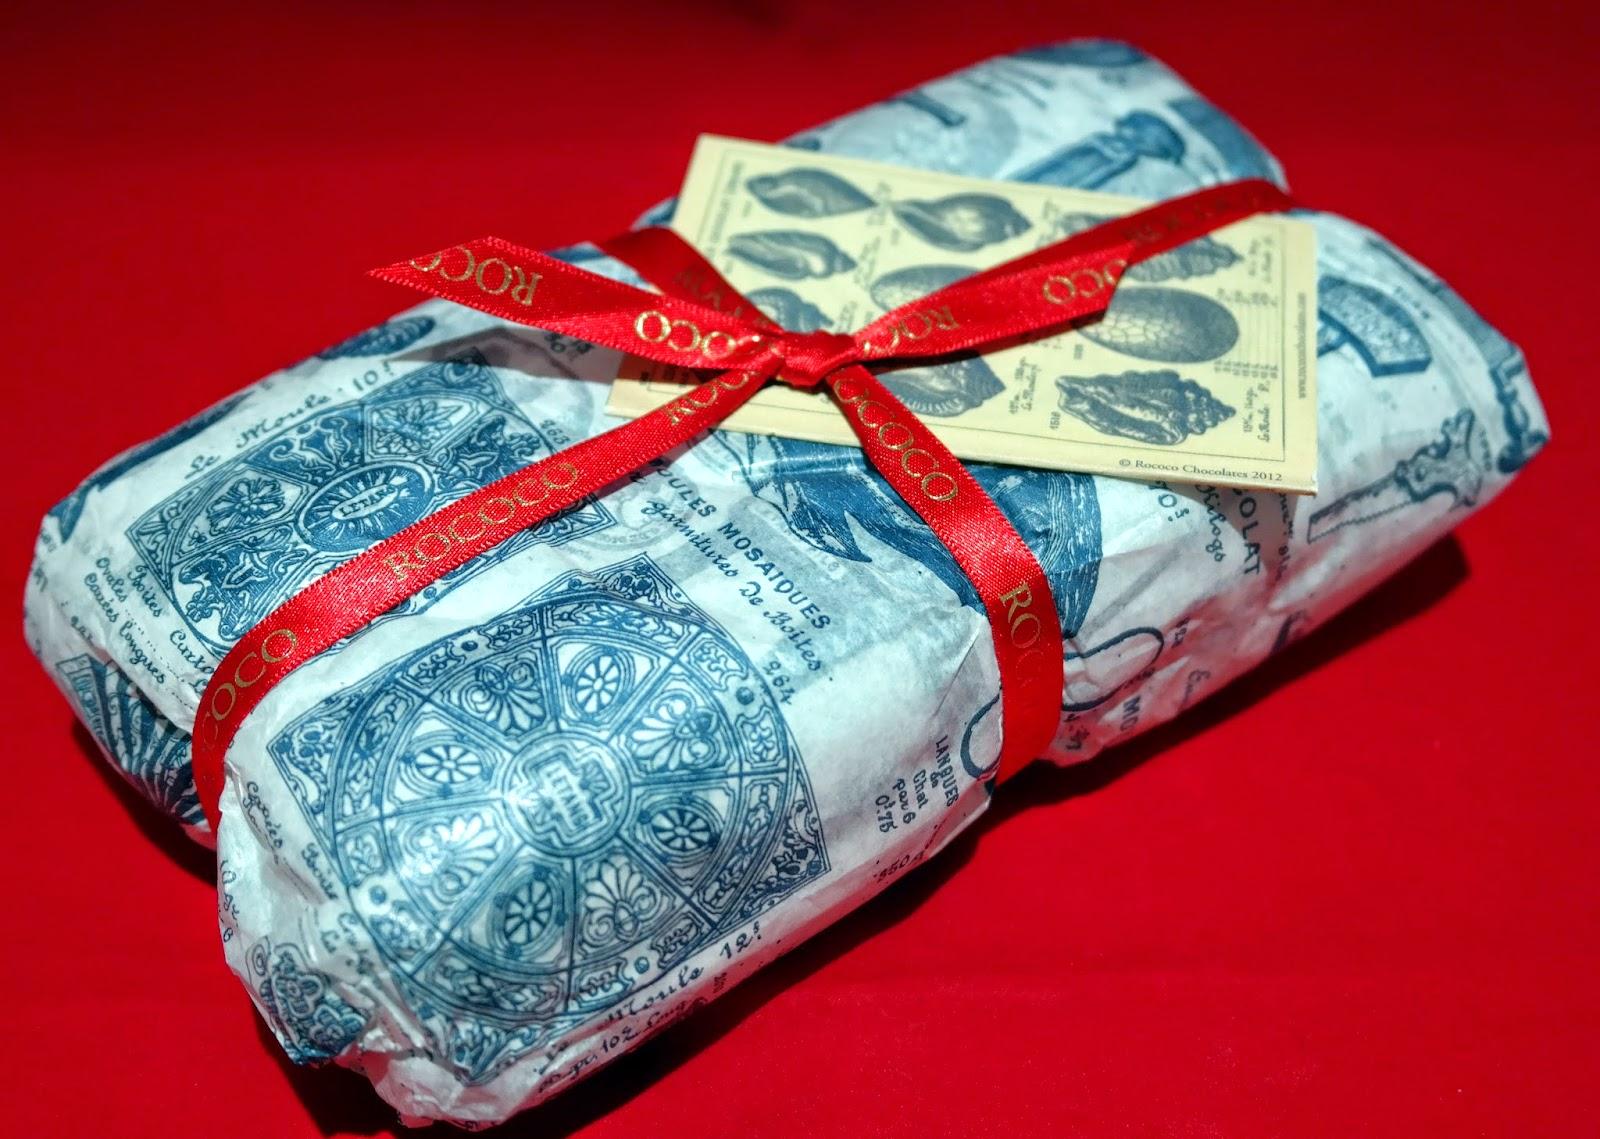 Christmas Gift Guide 2014 - BakingBar